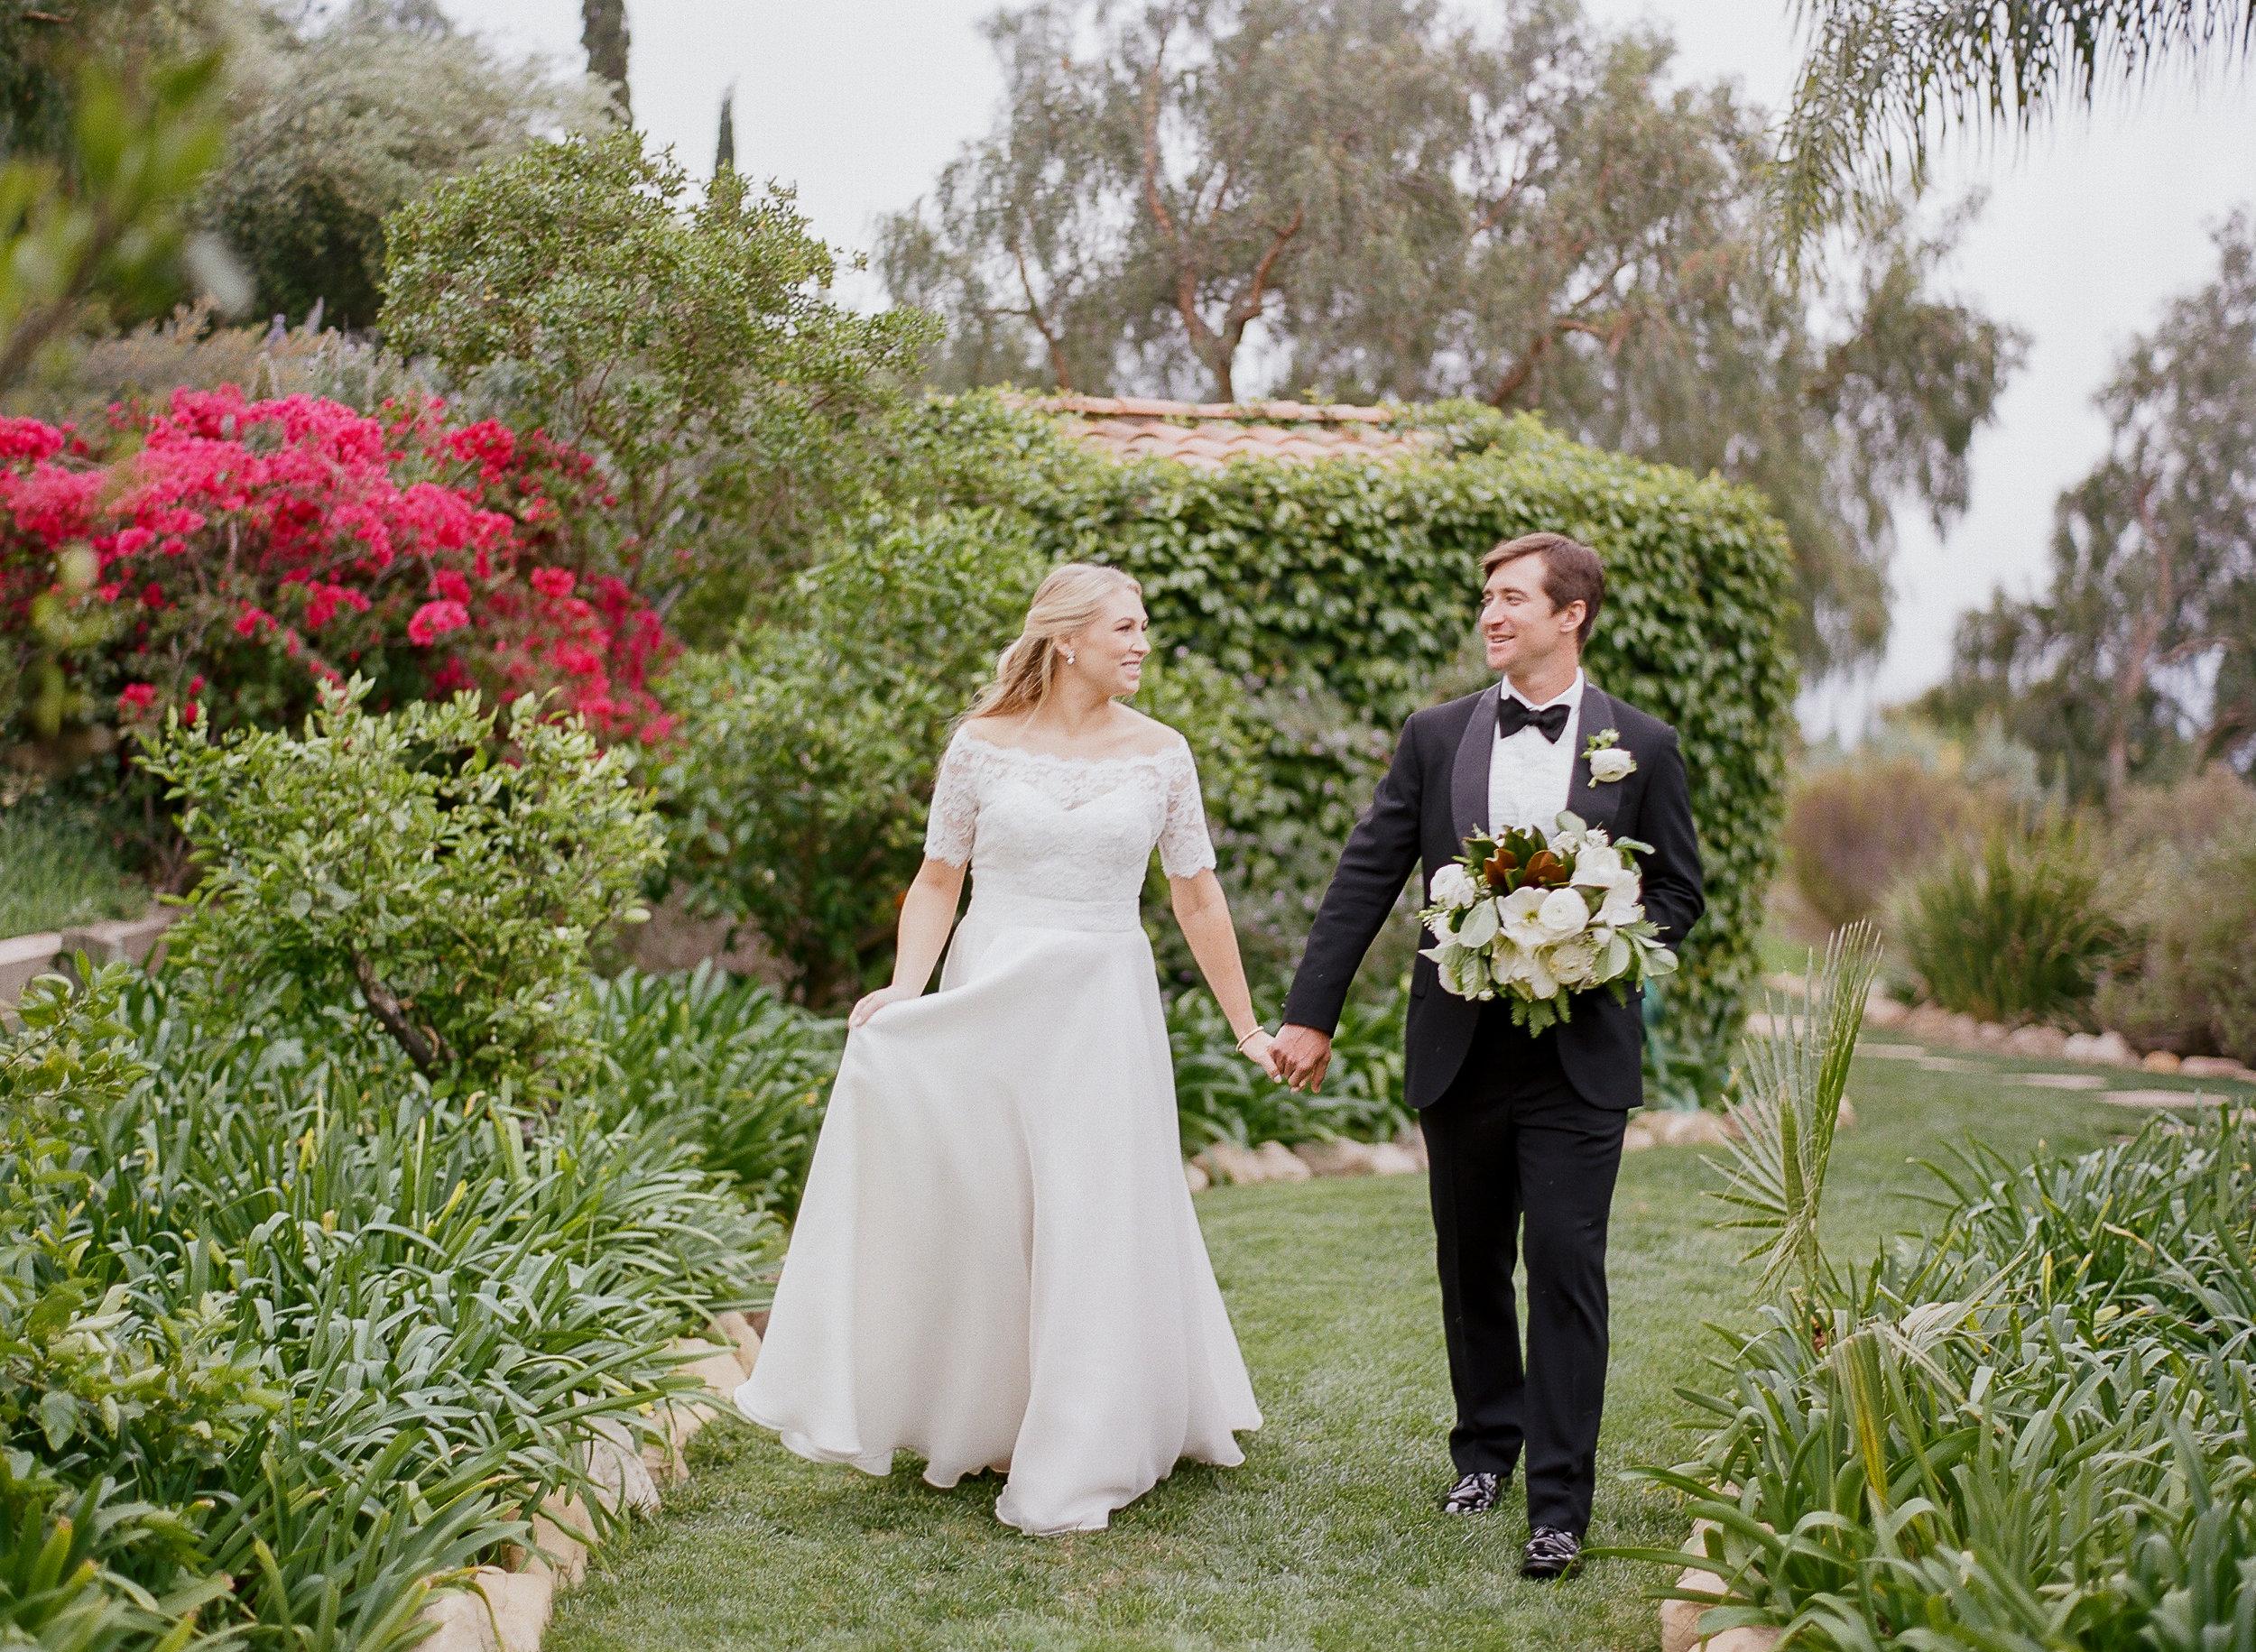 Classic White Wedding   Clarissa Koenig Photography   Felici Events   Ella & Louie